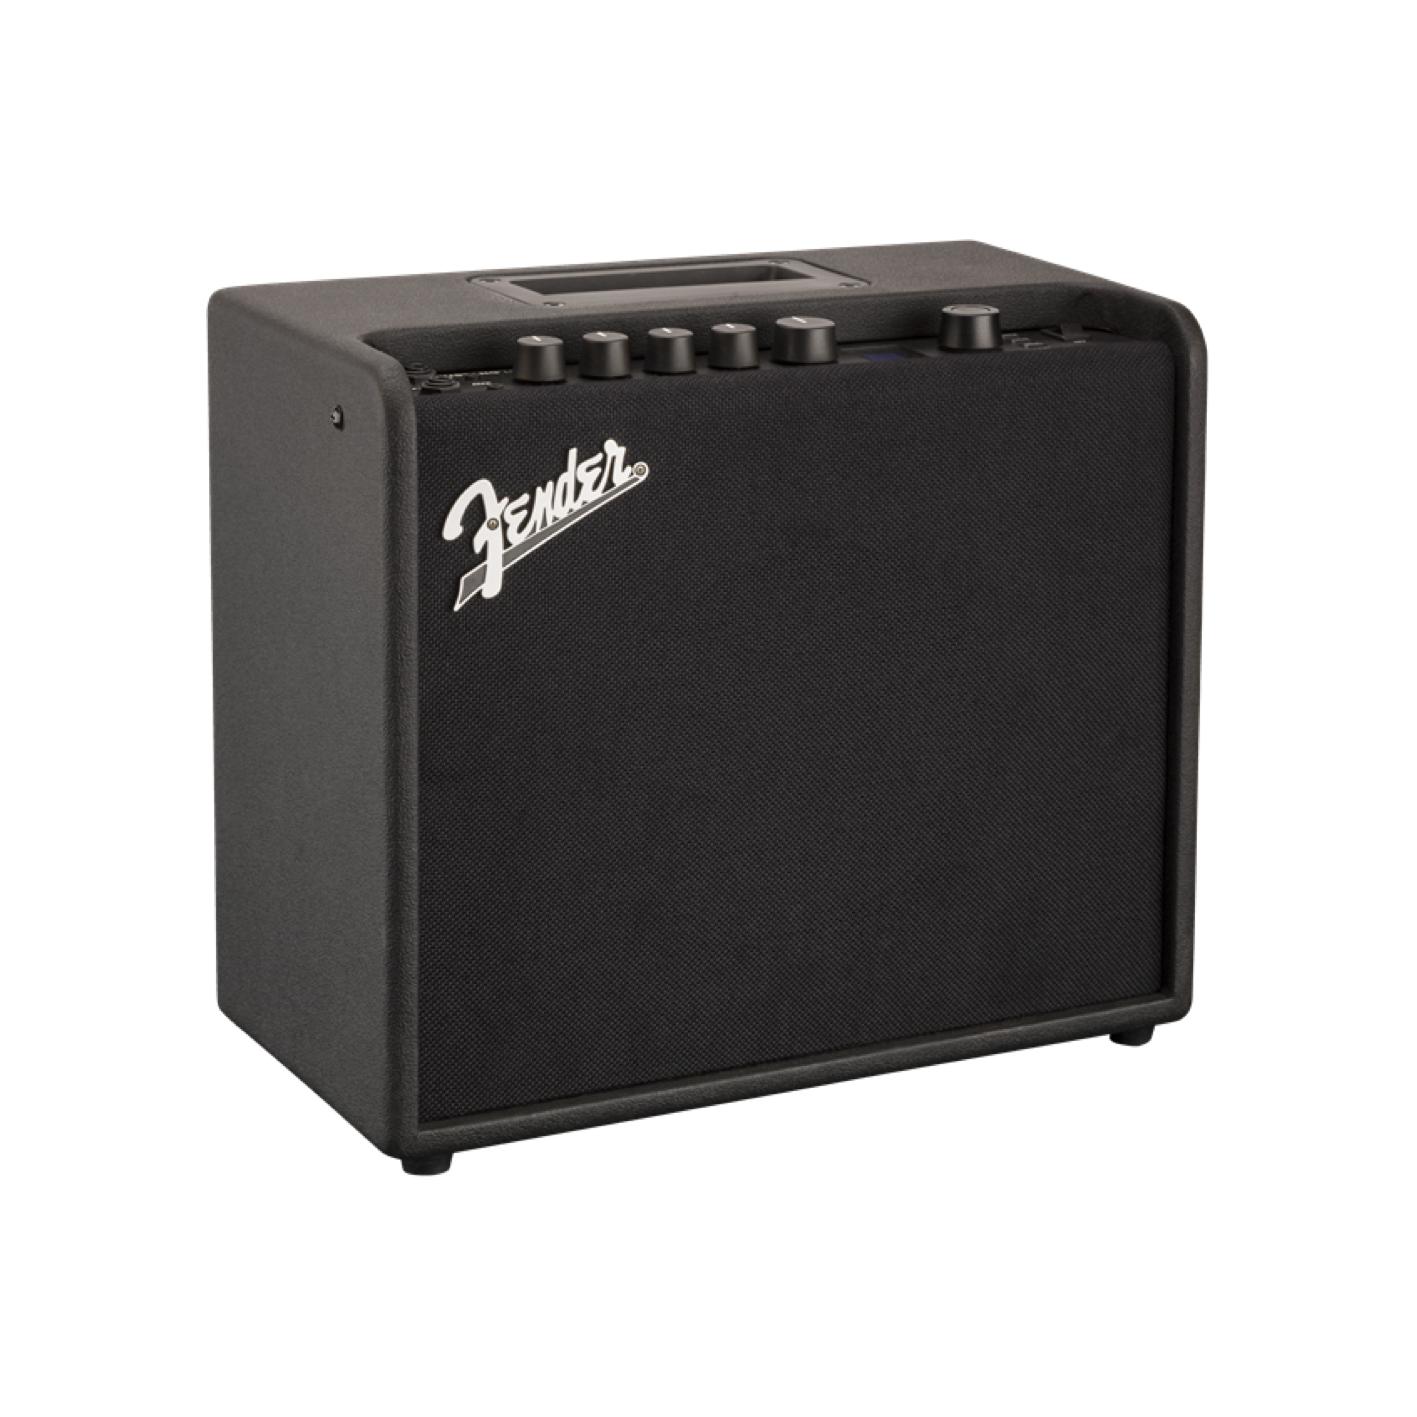 Fender Mustang LT25 Guitar Combo Amp